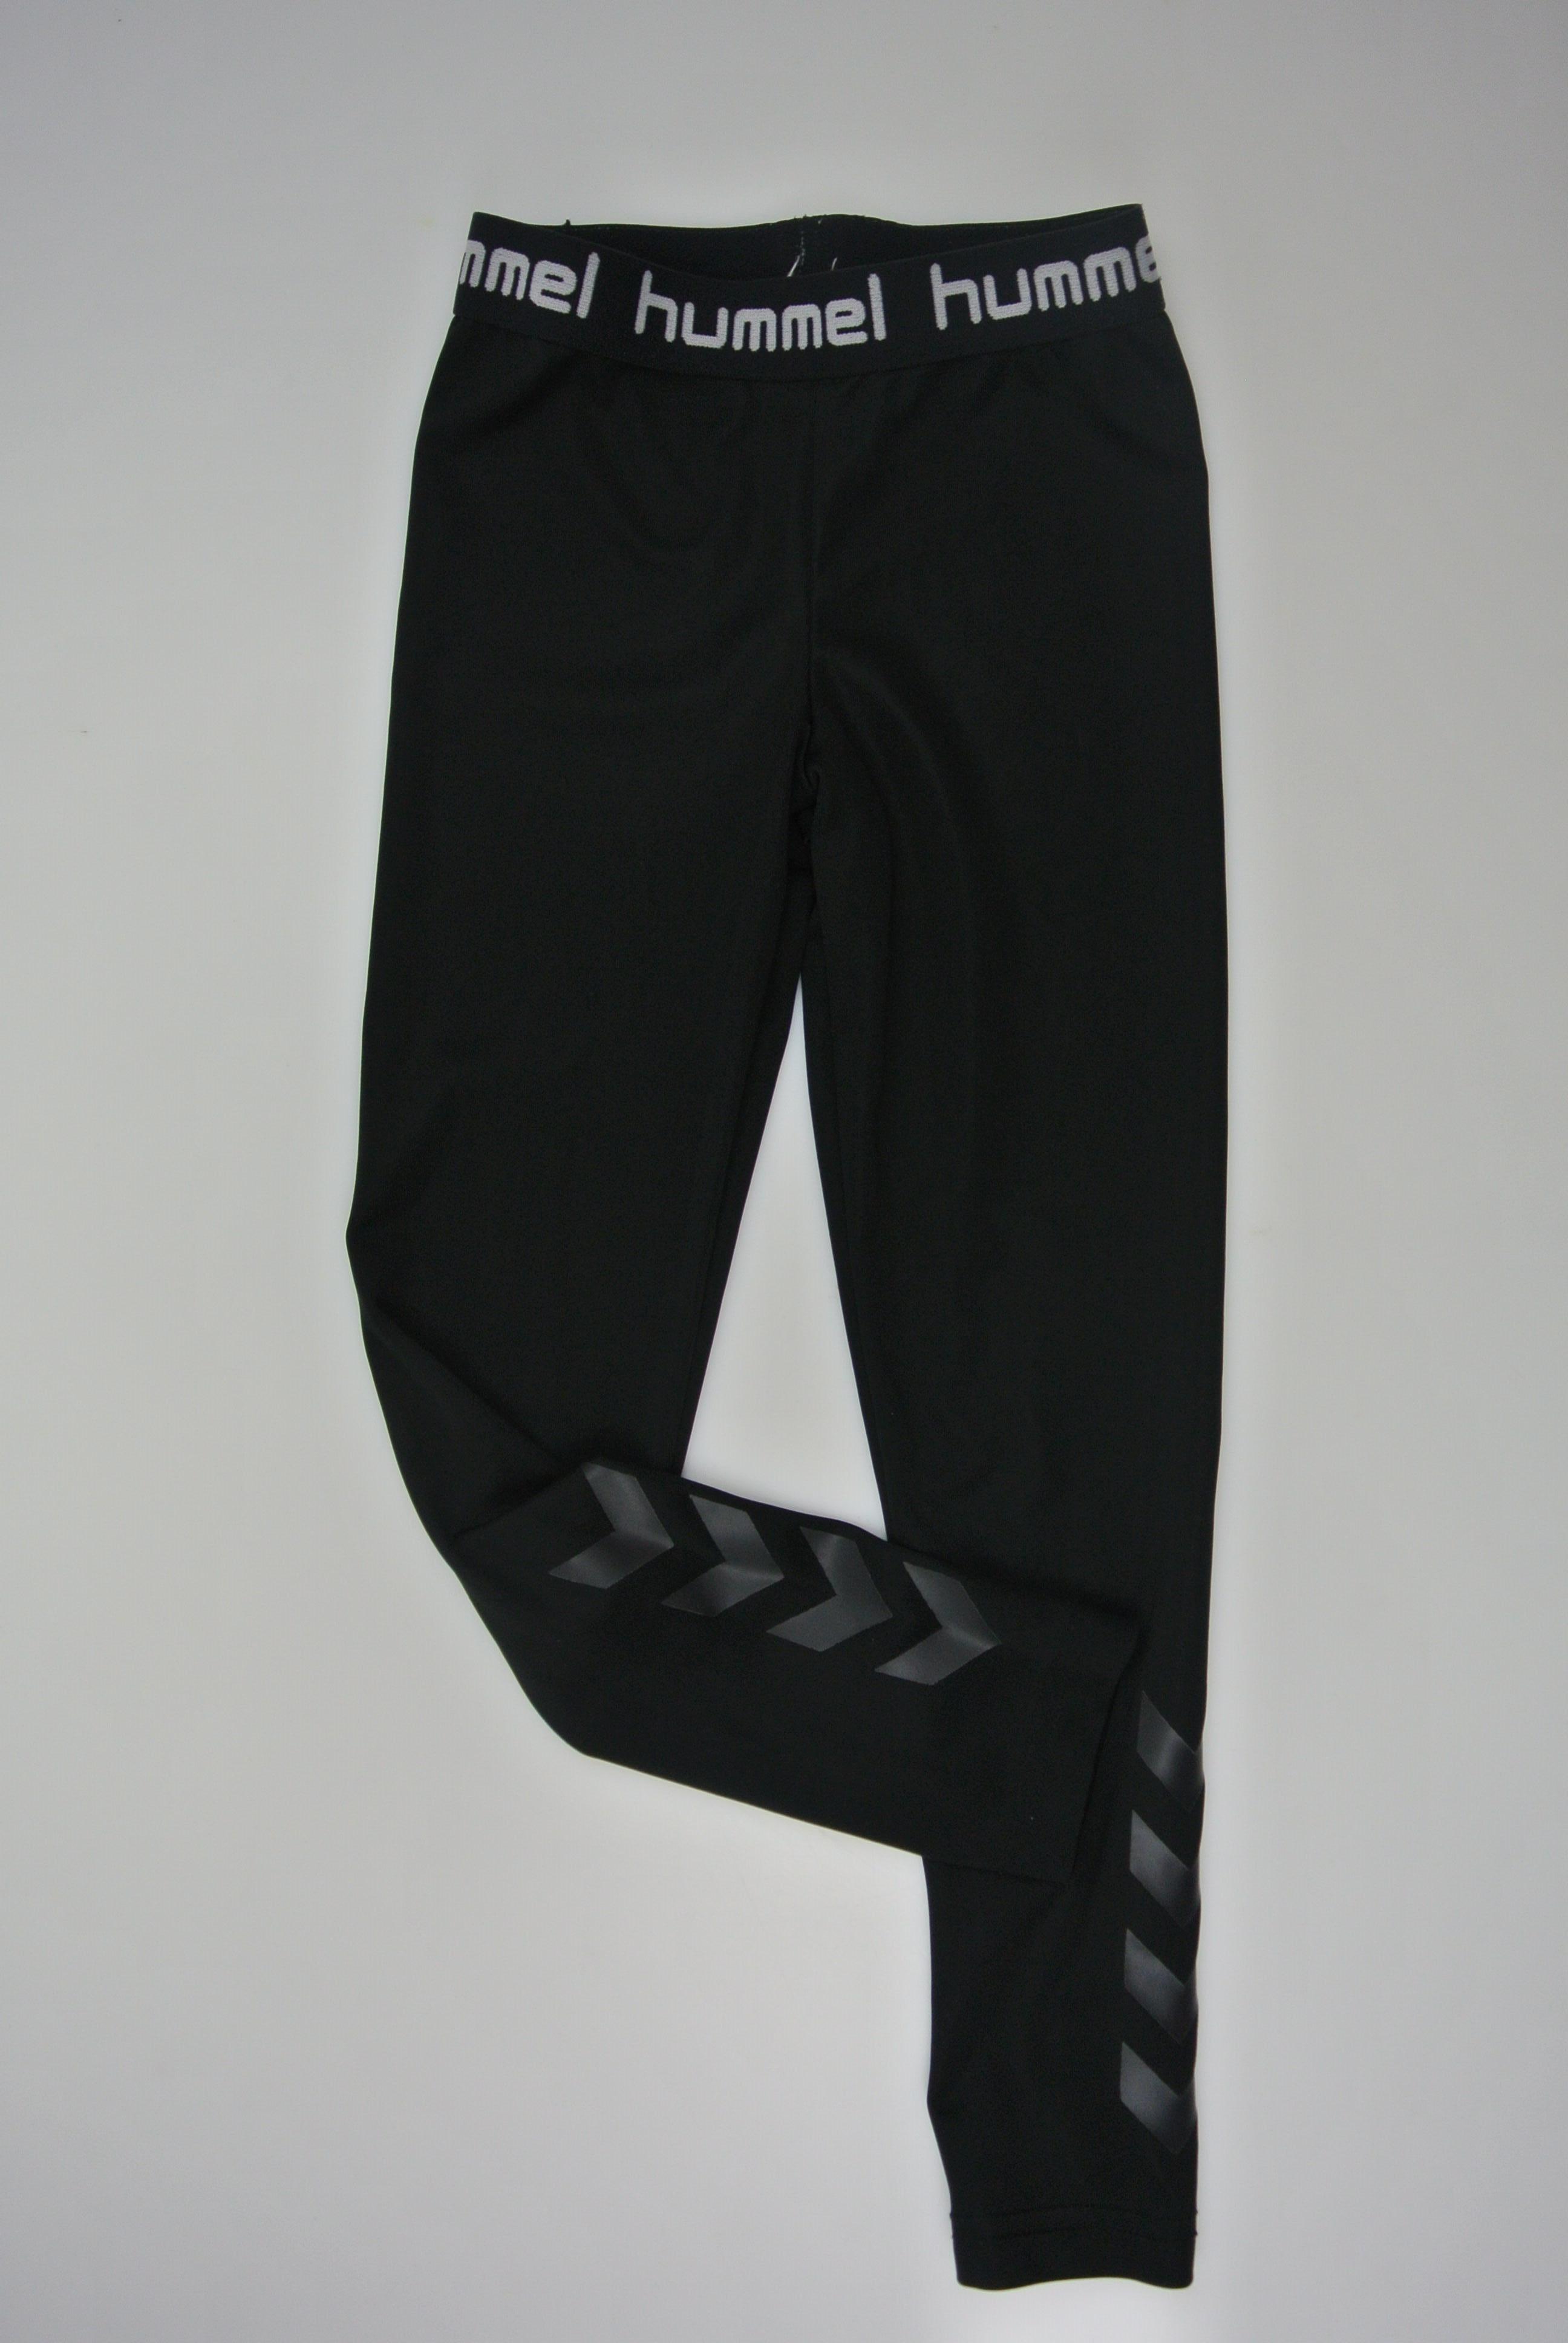 Nike bukser str 110 pige